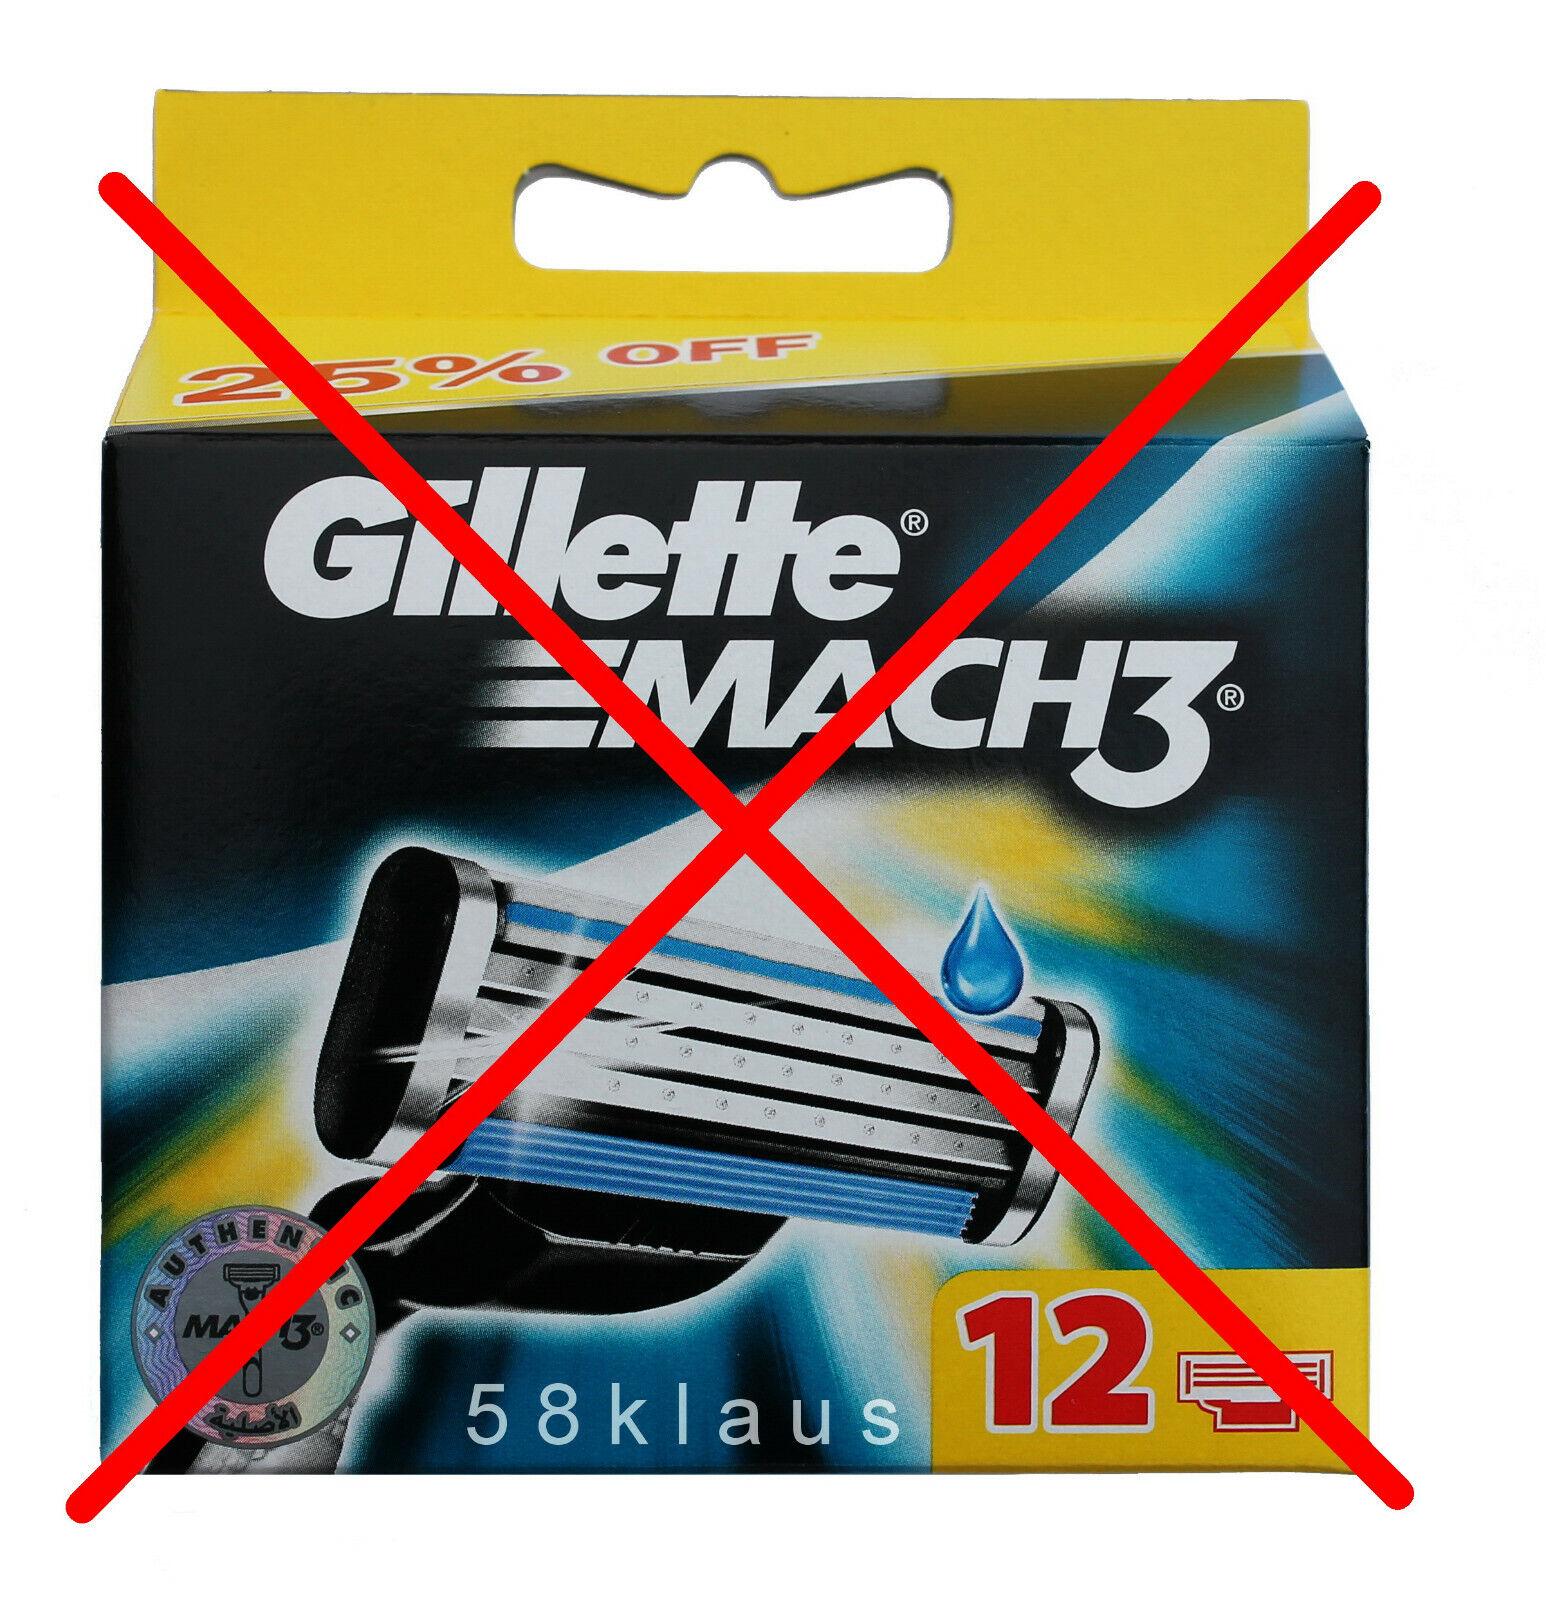 8 Gillette Mach 3 Rasierklingen 8er Mach3 Klingen im Blister Gilette NEU